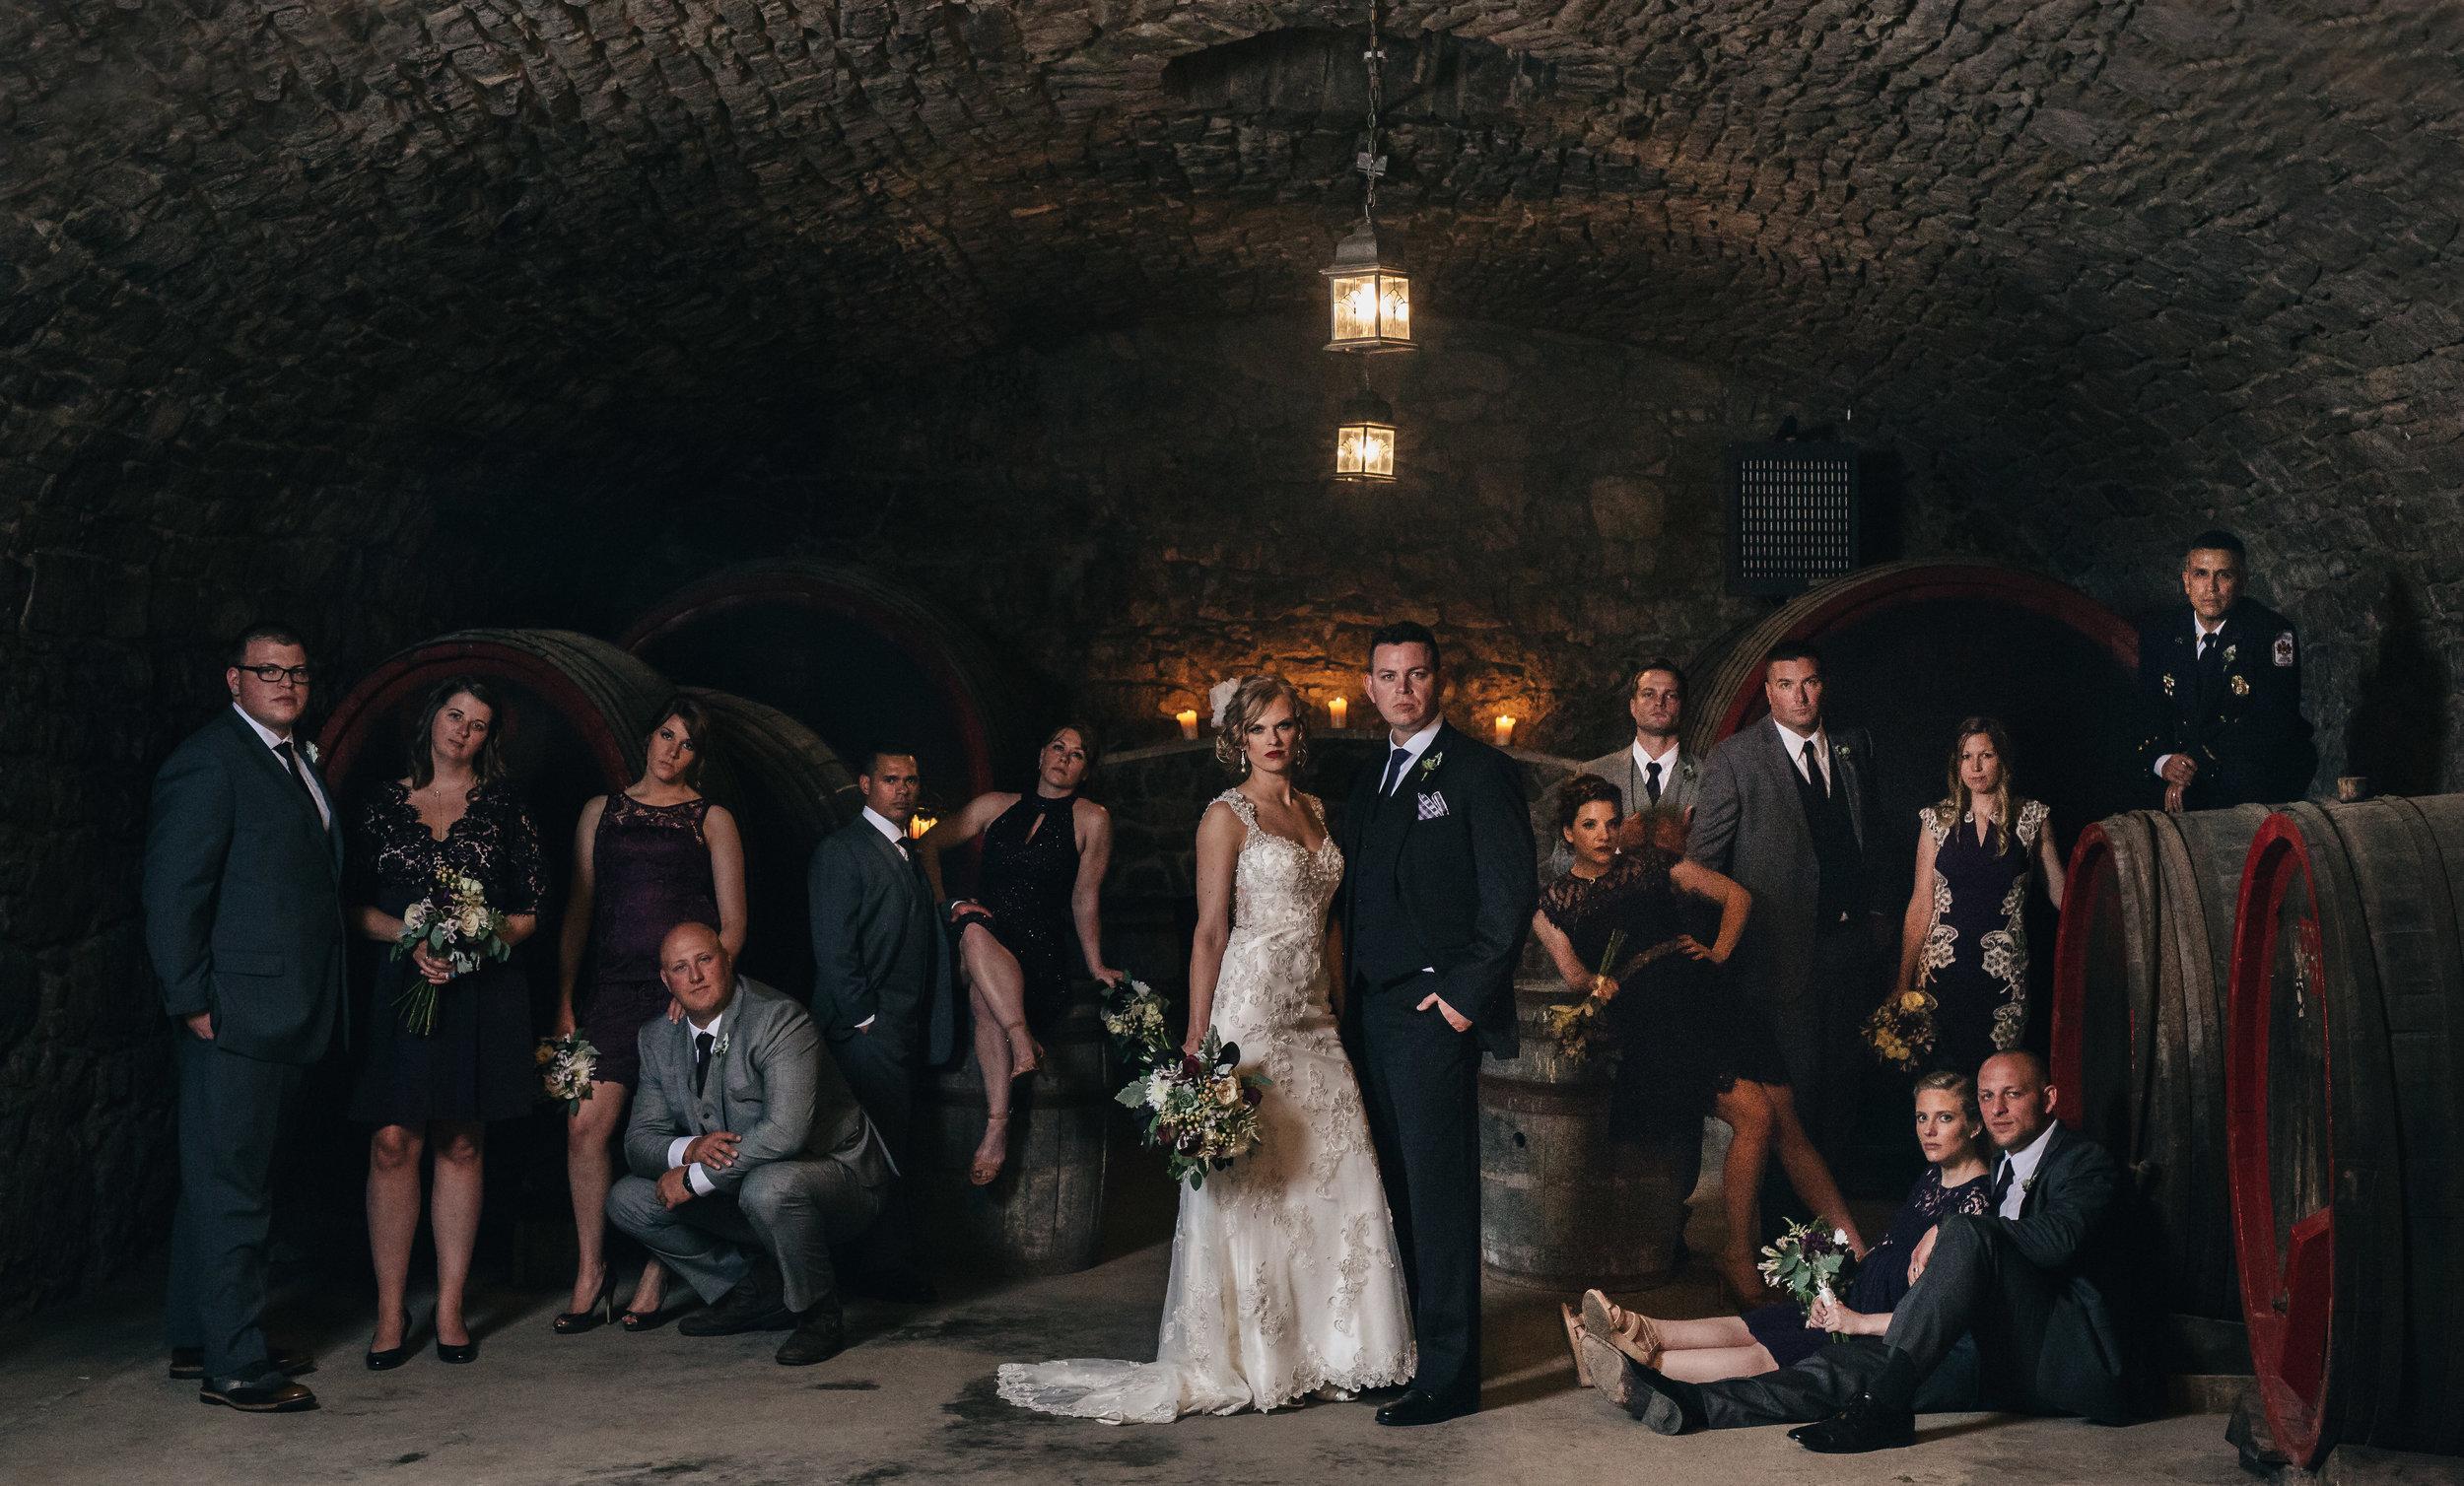 Bridal party portrait inspired by Annie Leibovitz.